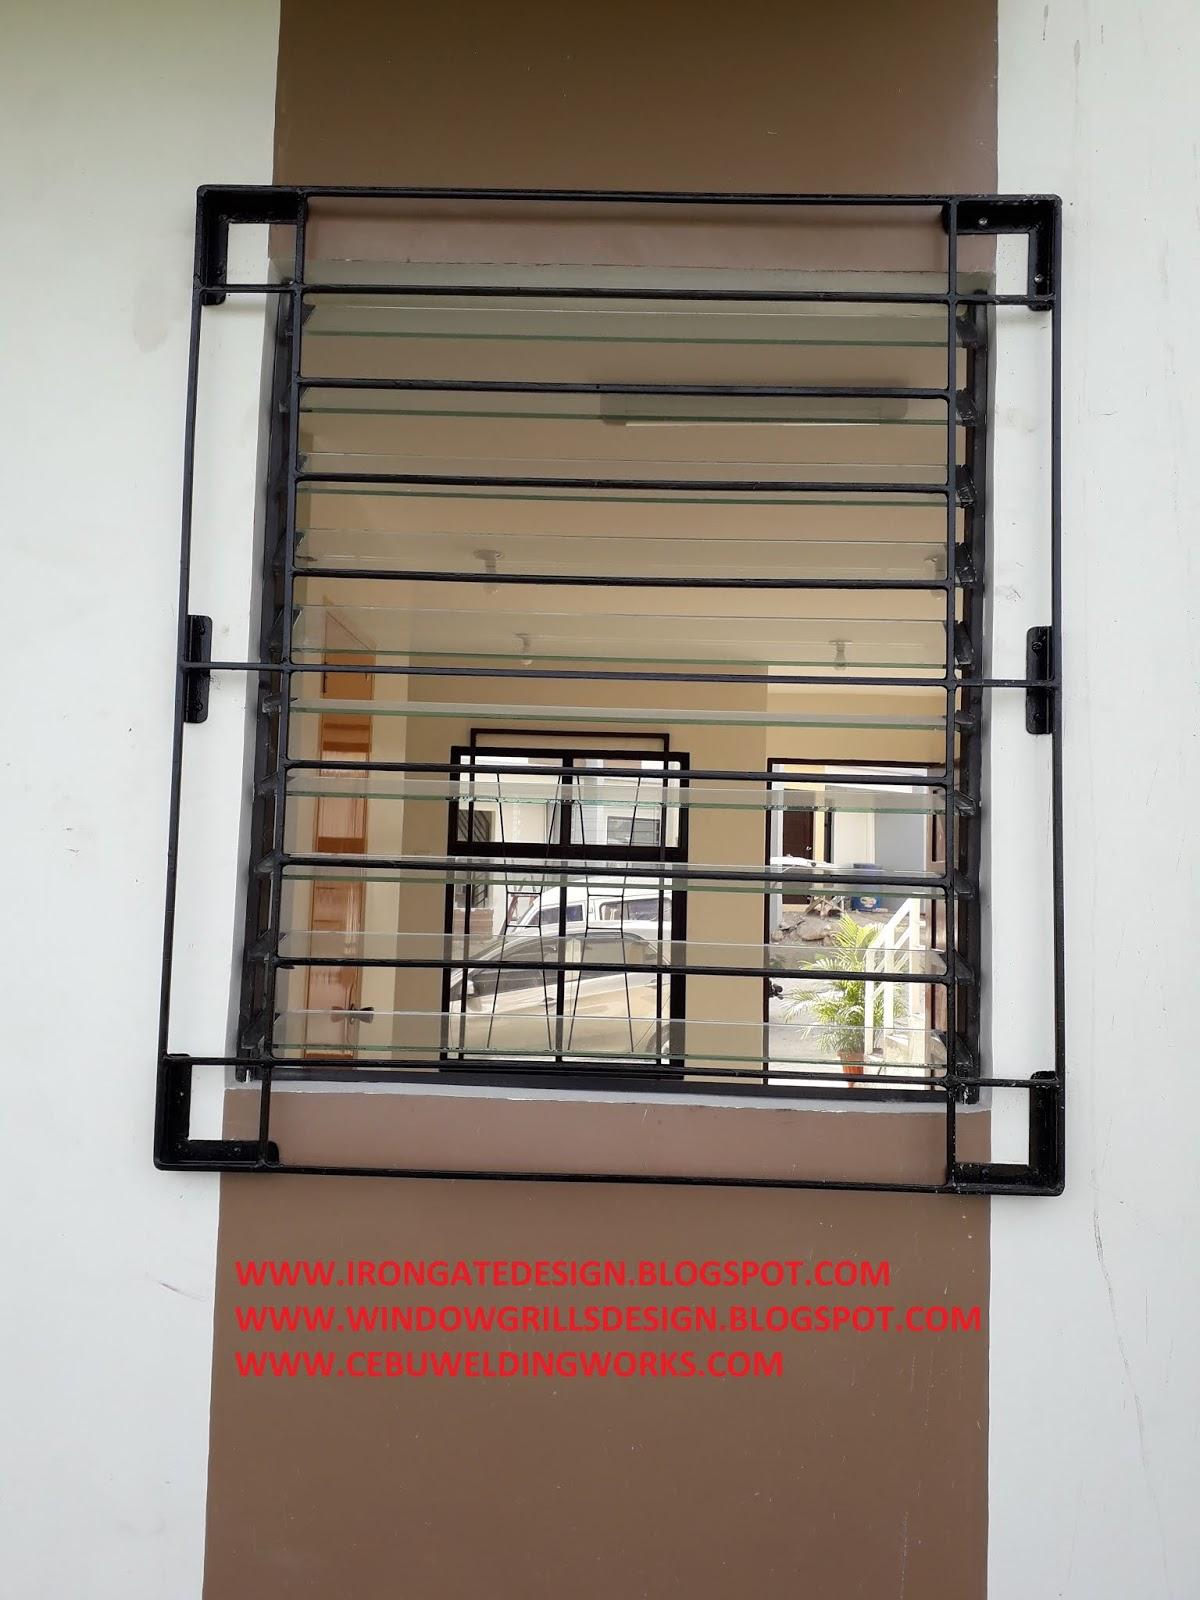 Simple Window Grill Designs: WINDOW GRILLS MAKER IN CEBU